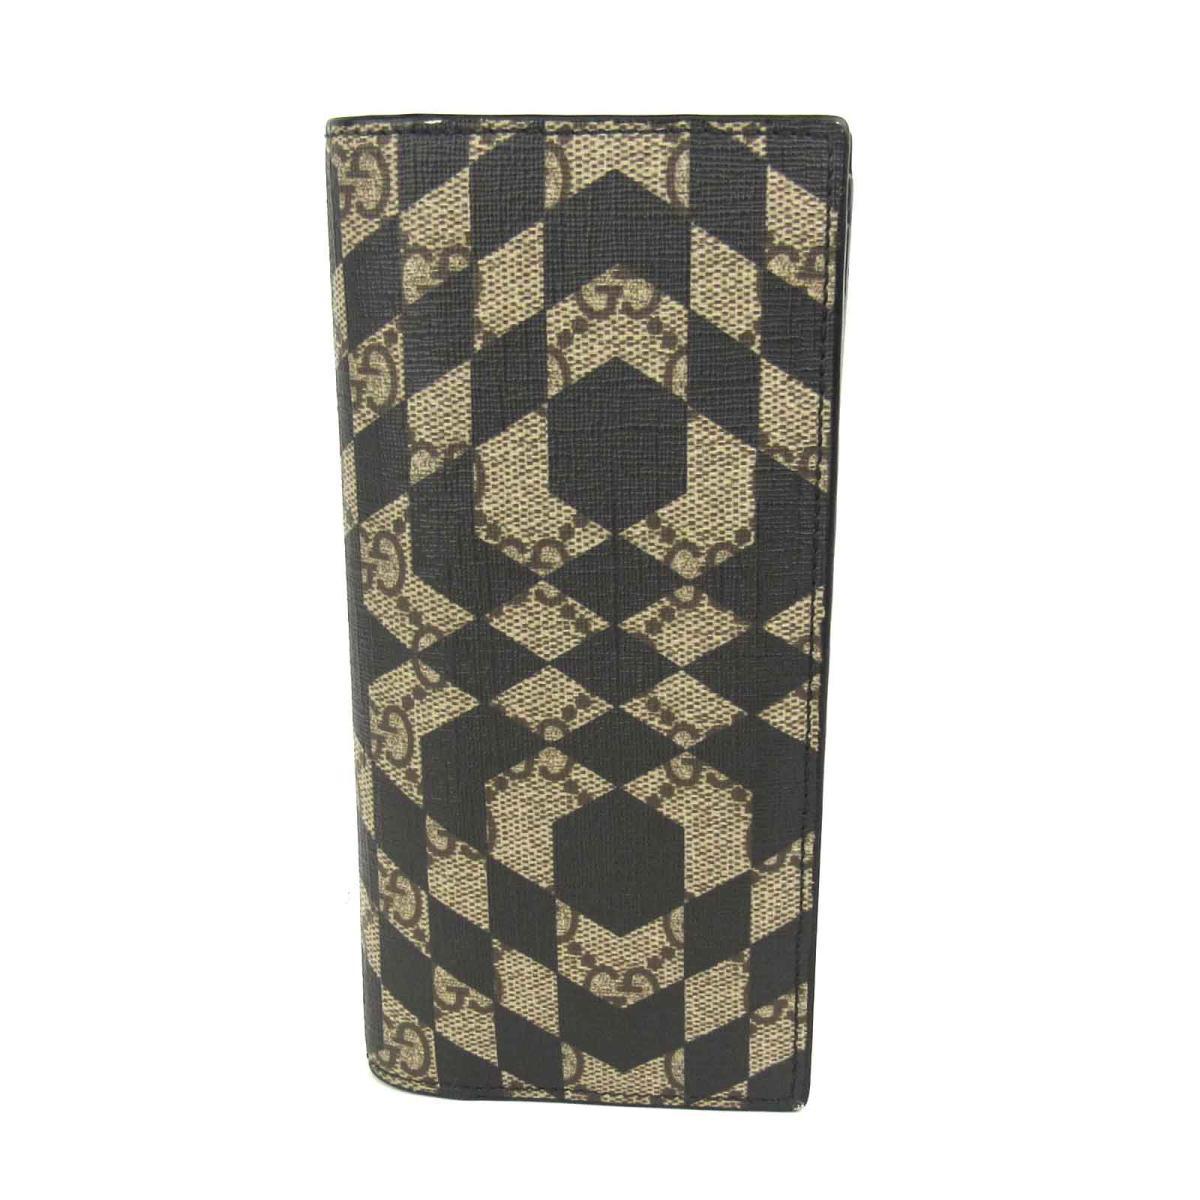 5144d0da58fb グッチ GGスプリーム 二つ折り長財布 財布 メンズ レディース コーティングキャンバス (PVC) ブラウン